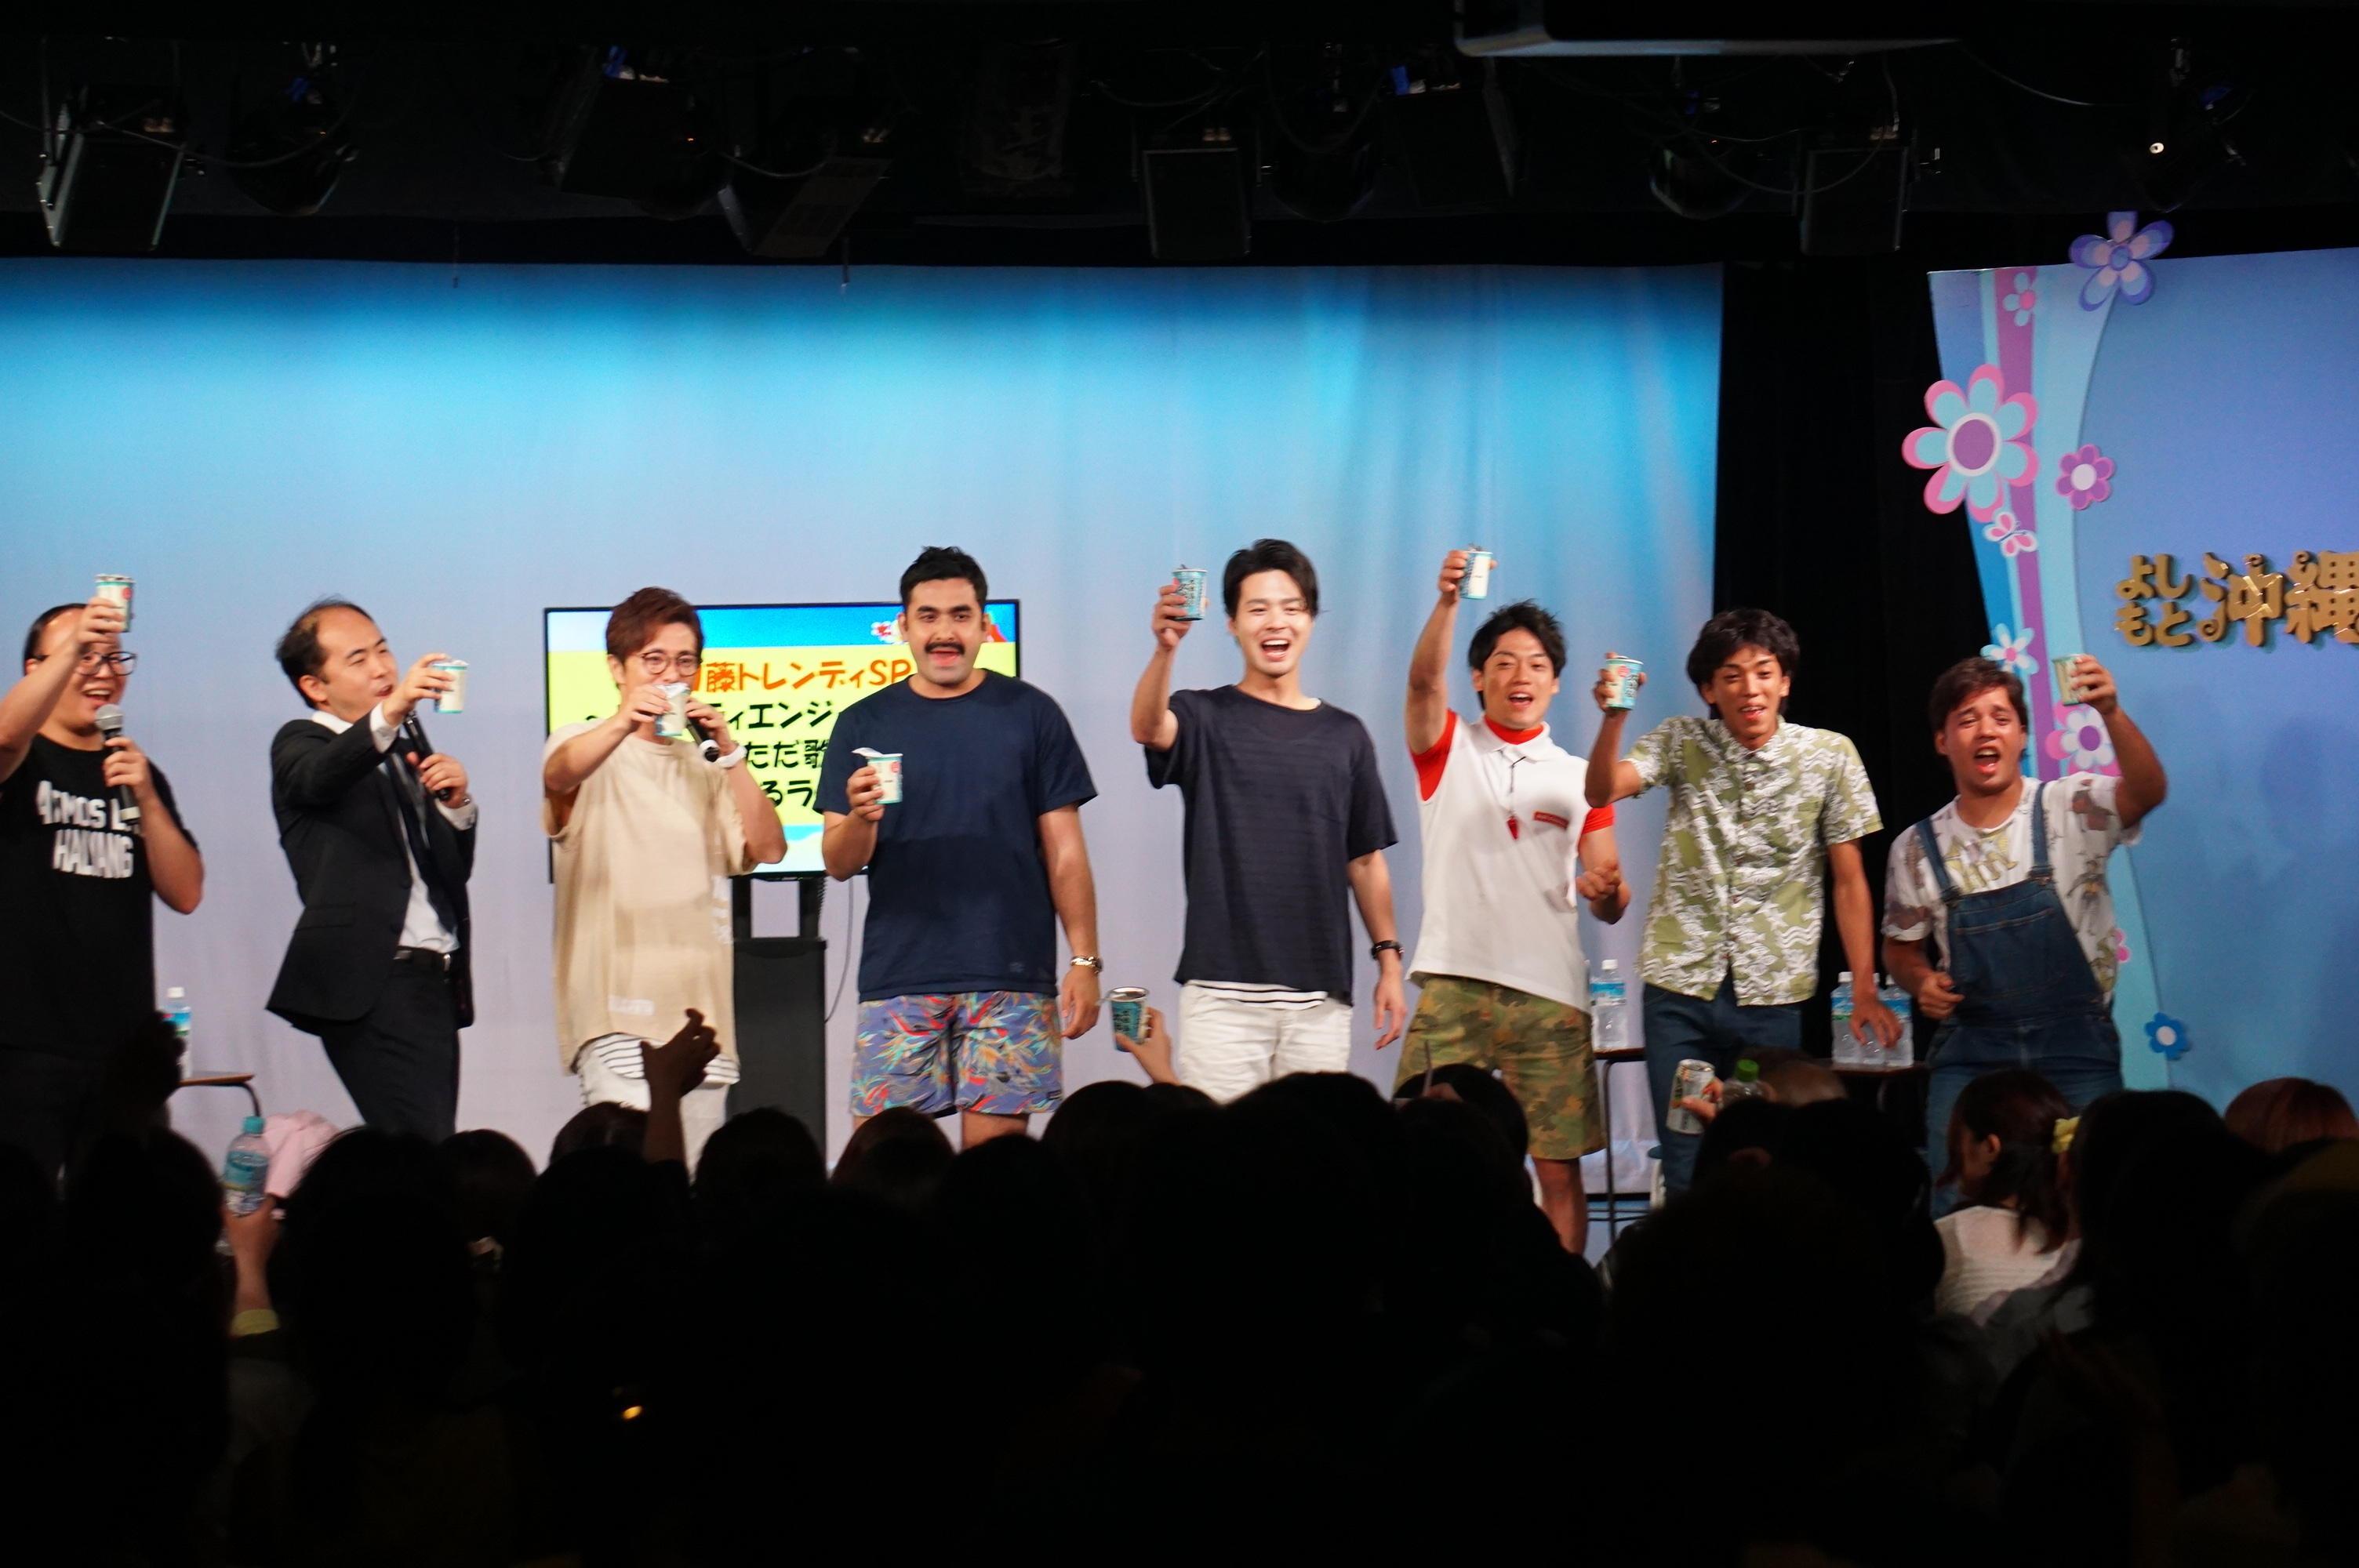 http://news.yoshimoto.co.jp/20160729181452-17ef05337a2fda622916945f07e4d6ac9281e813.jpg